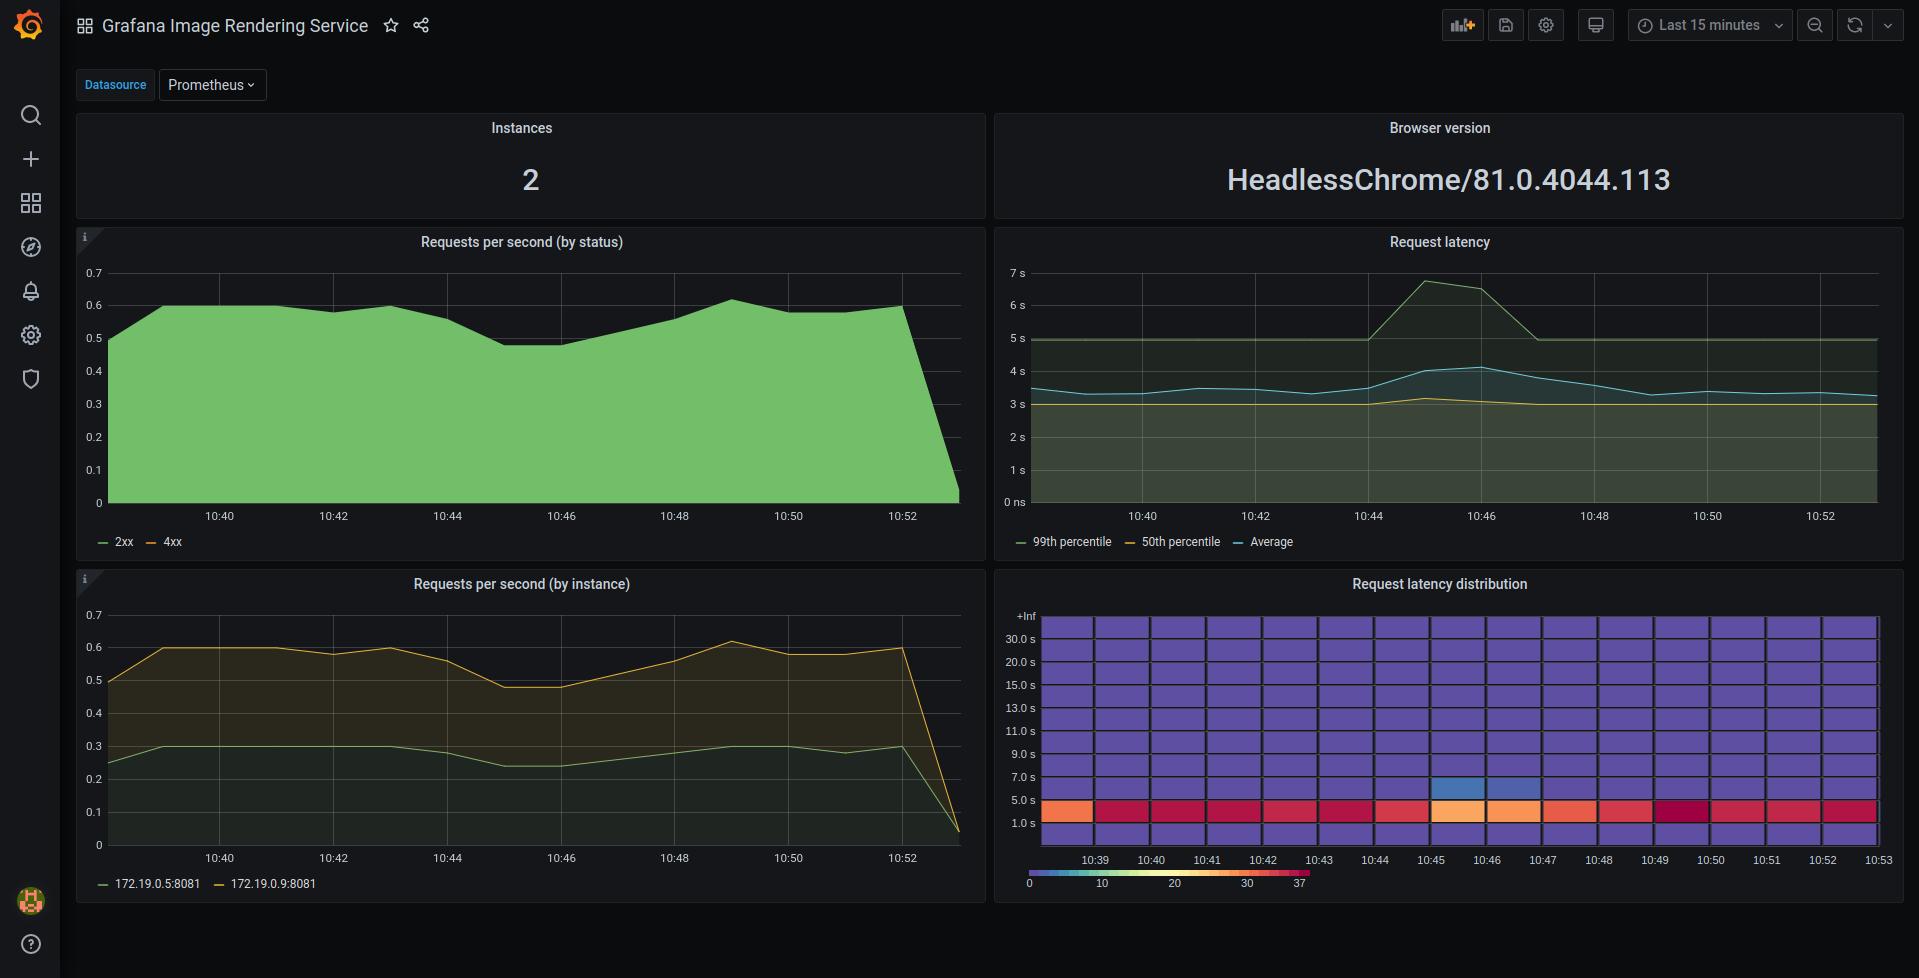 Grafana Image Rendering Service dashboard